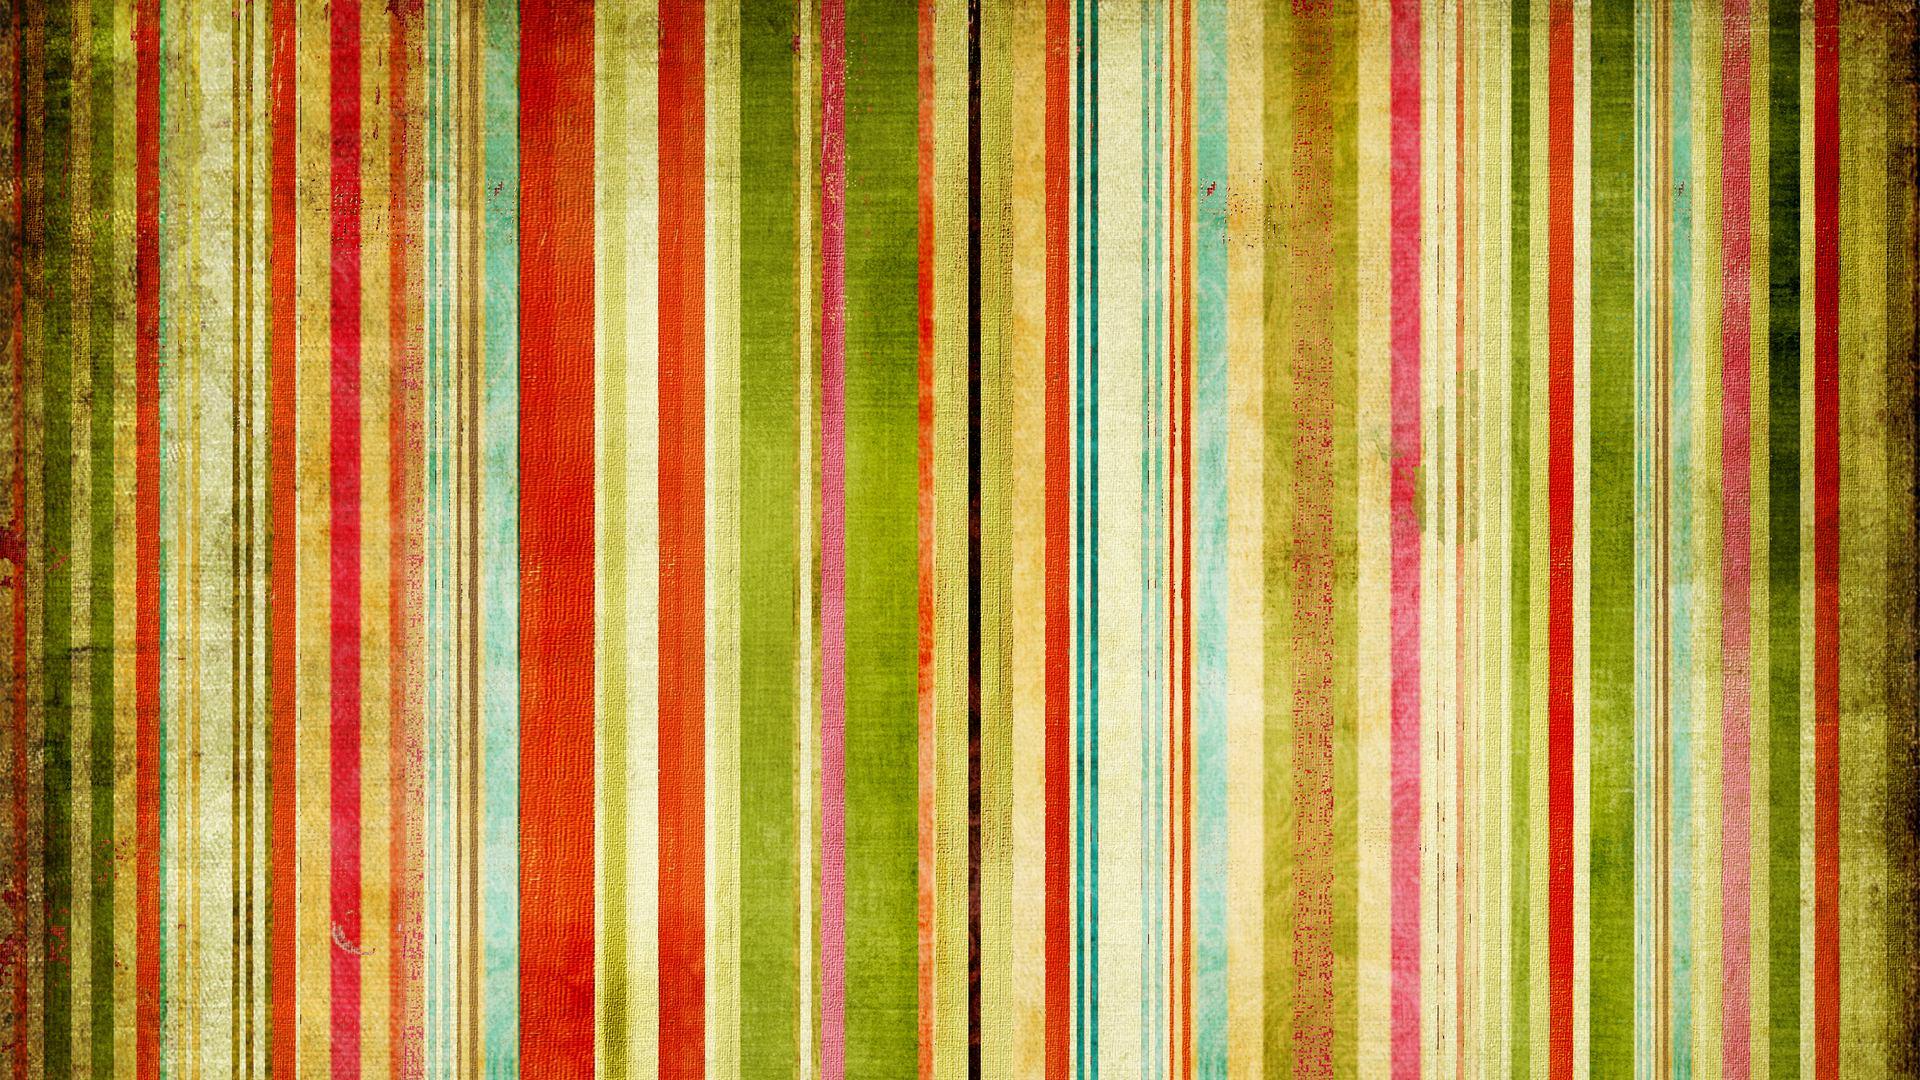 Grunge Stripes Desktop Wallpaper